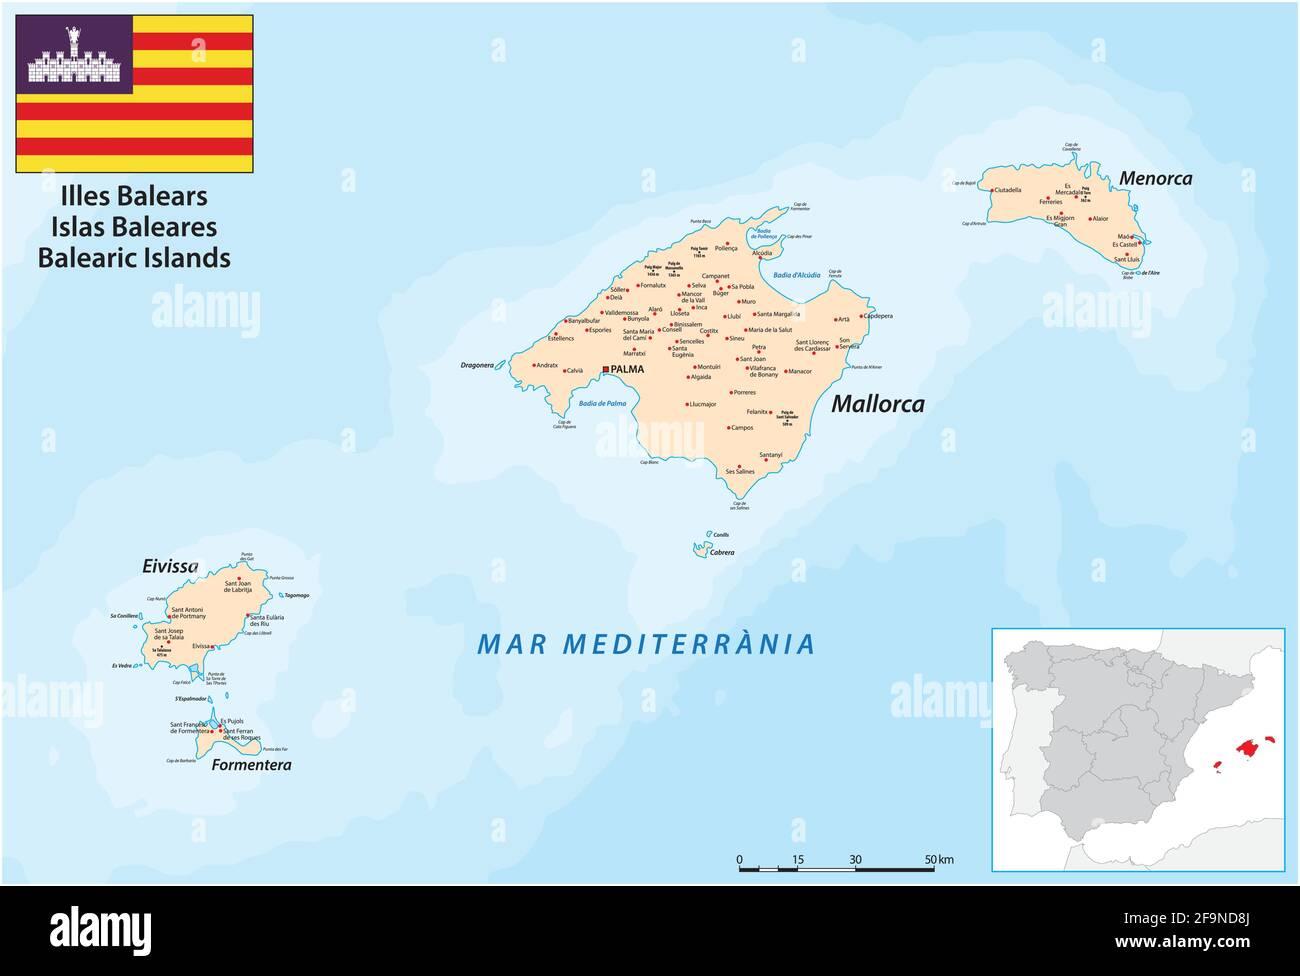 Cartina Spagna Isole Baleari.Mappa Di Ibiza Ibiza Isole Baleari Spagna Estate In Europa Foto Stock Alamy